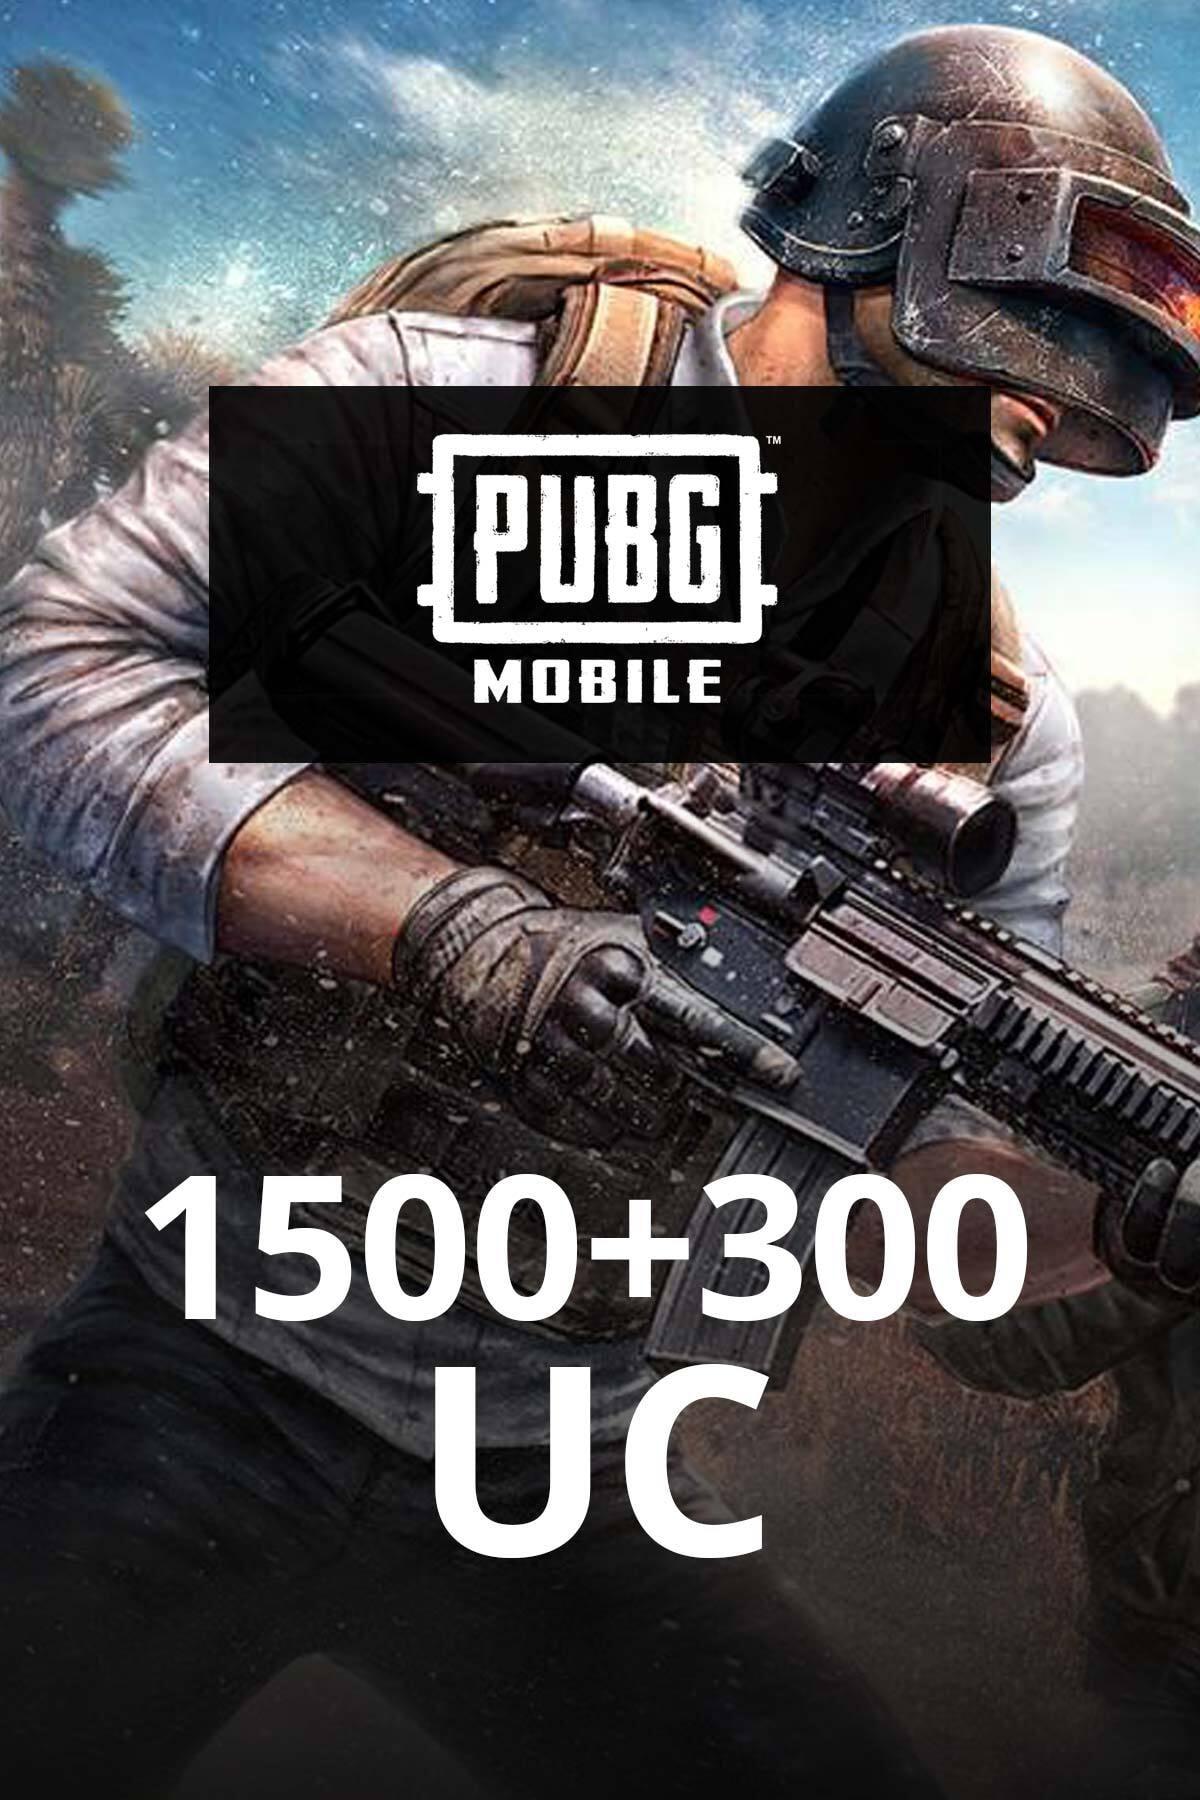 Mobile 1500 + 300 UC